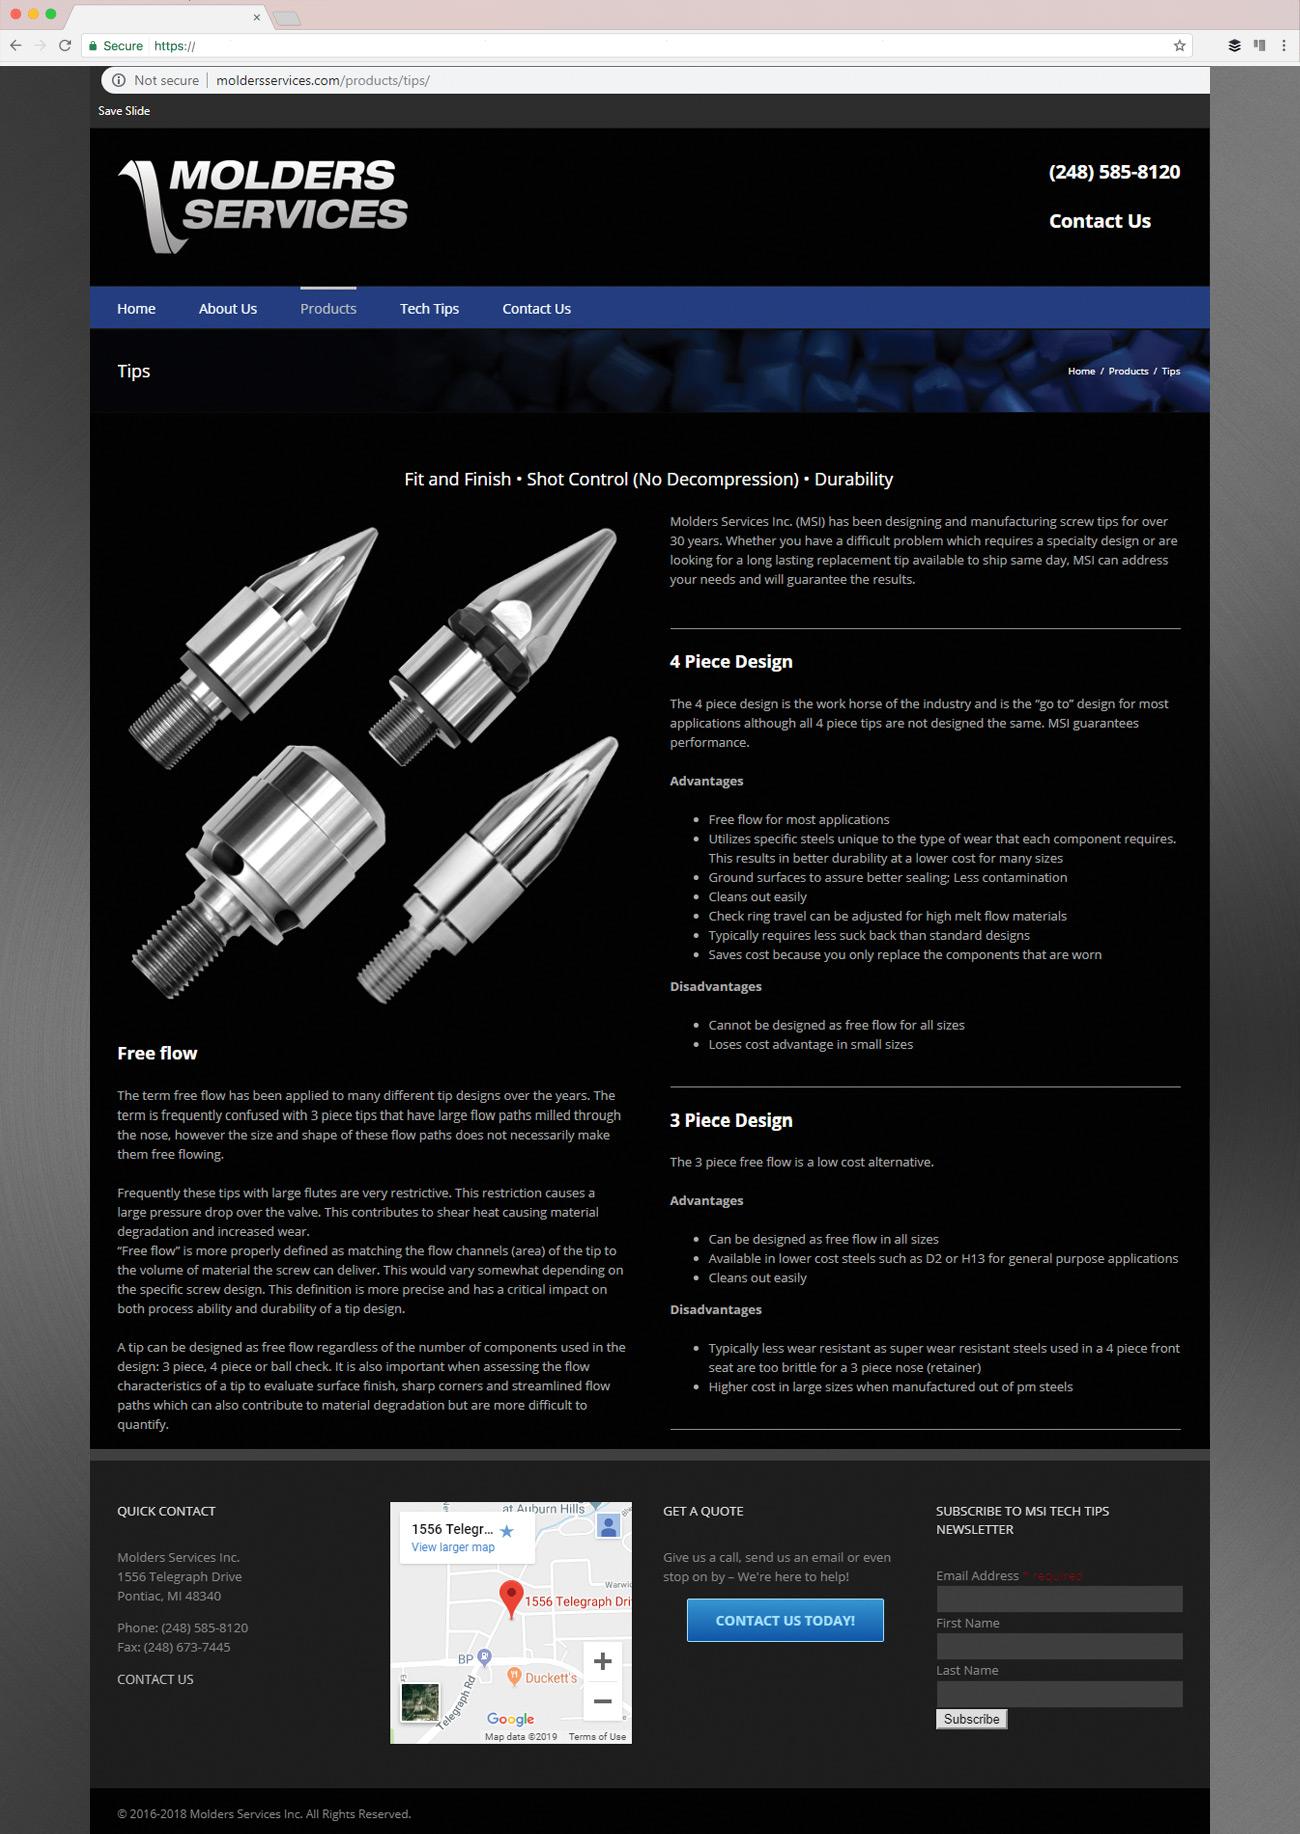 molders-services-veronica-kerr-web-4